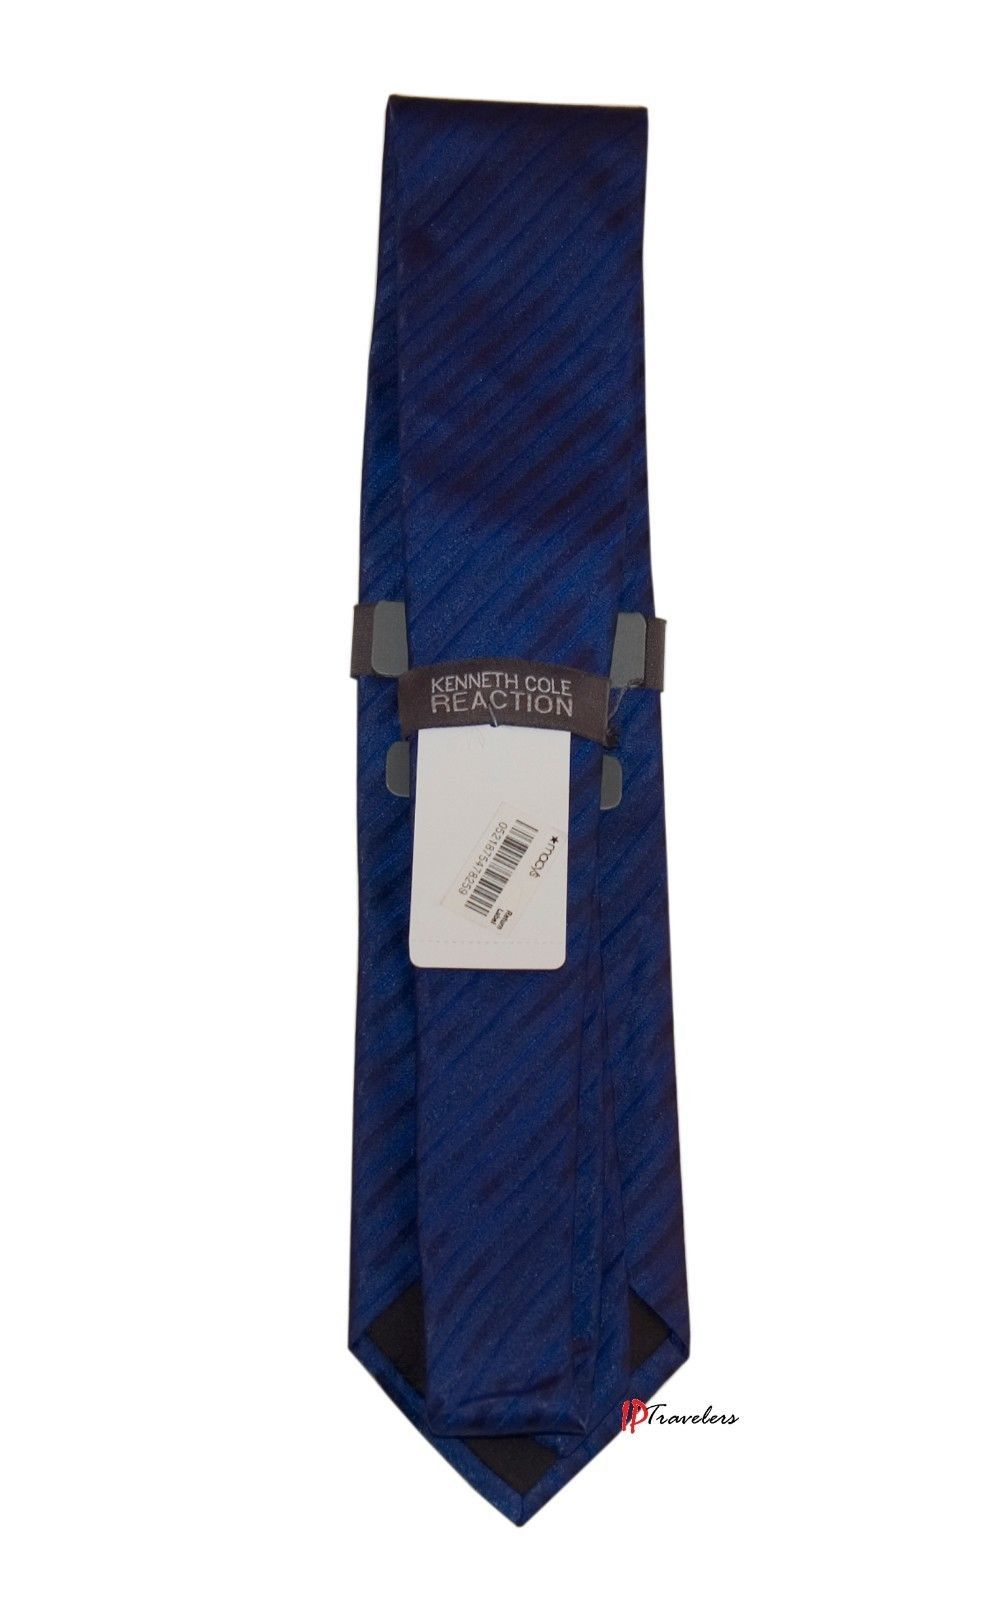 Kenneth Cole Reaction Men's Neck Tie Blue Airmont Stripe 100% Silk $55